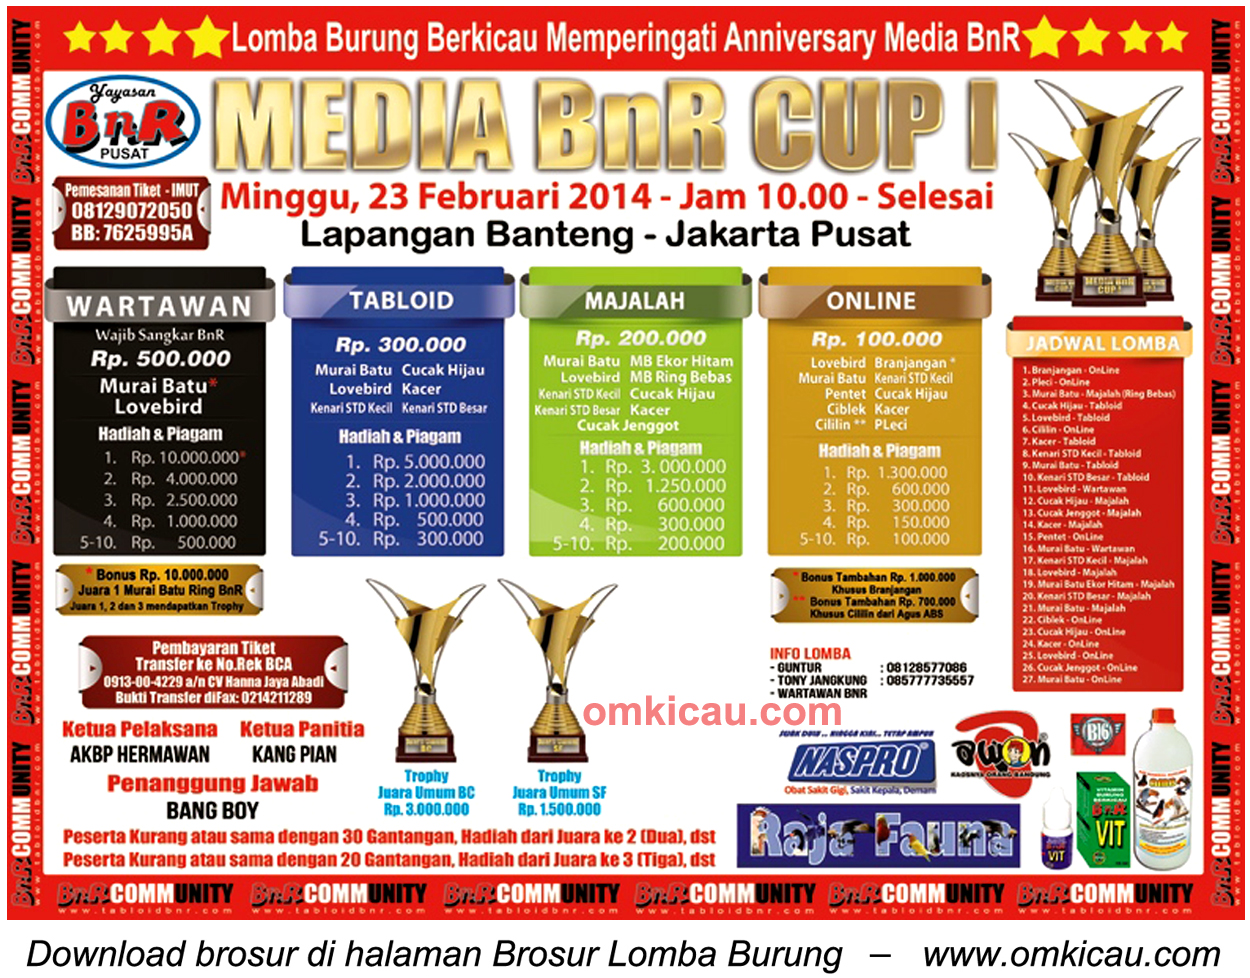 Brosur Lomba Burung Berkicau Media BnR Cup I, Jakarta, 23 Februari 2014